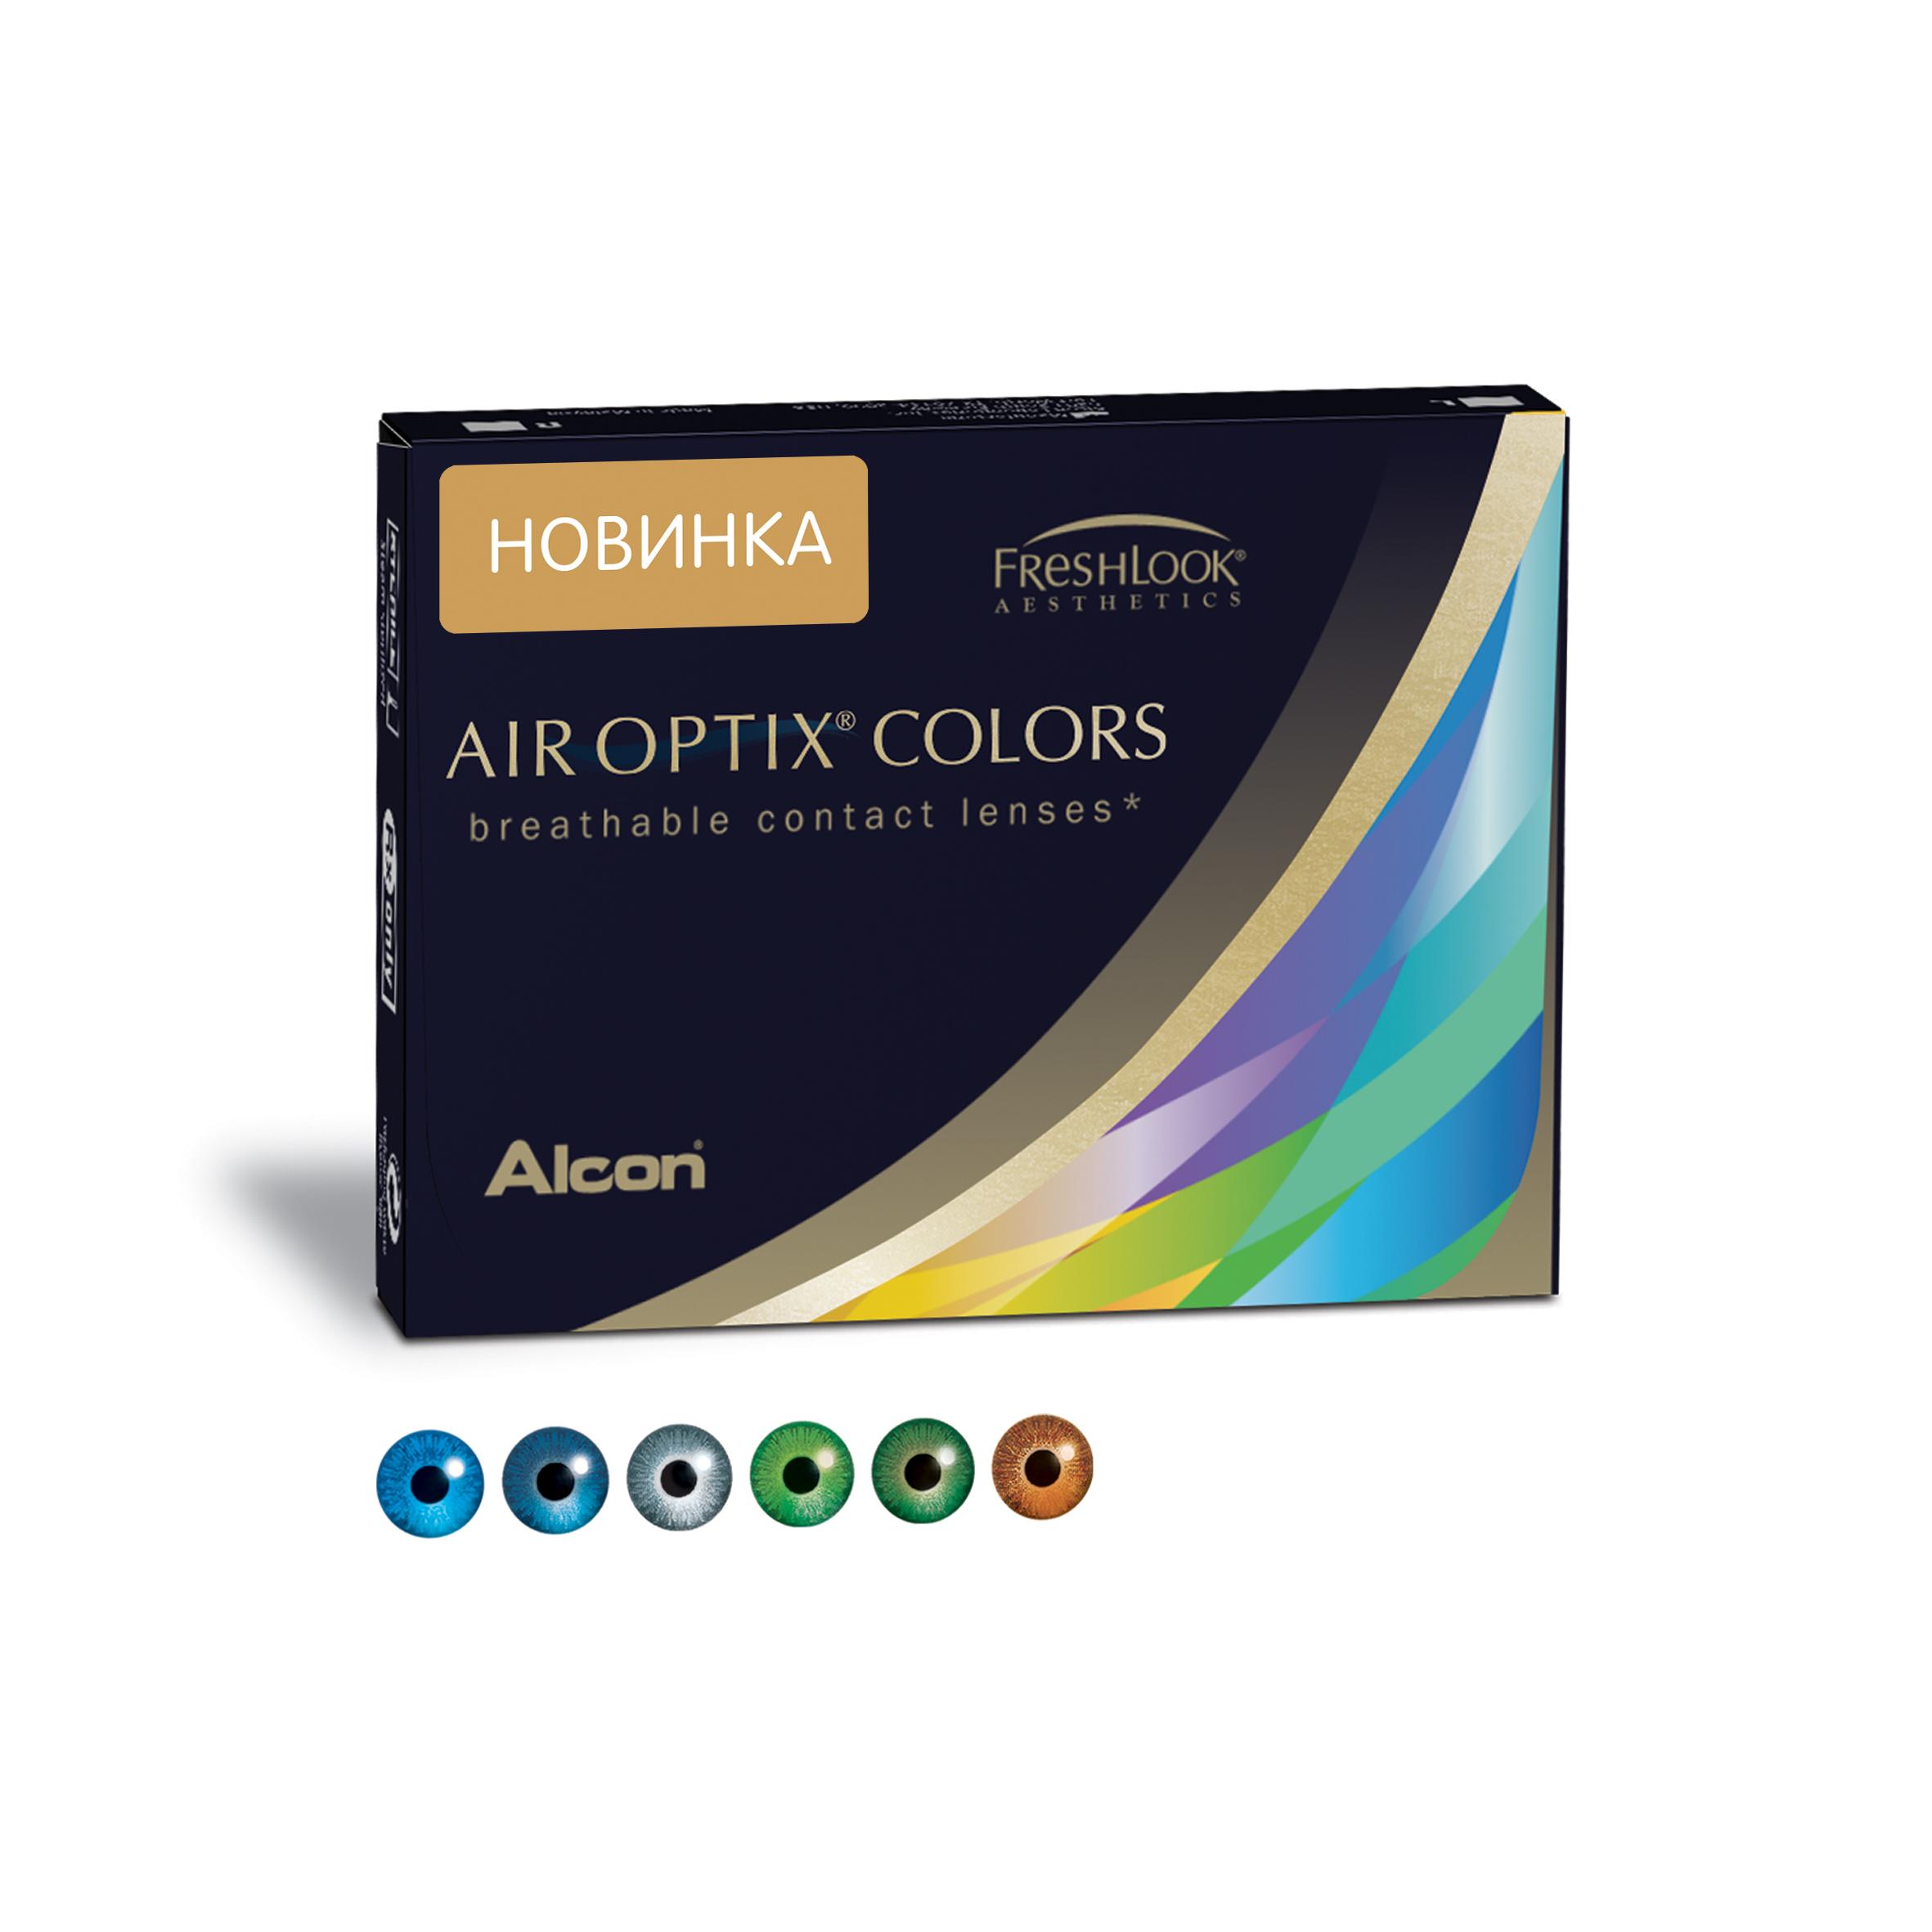 Аlcon контактные линзы Air Optix Colors 2 шт -3.00 Brilliant Blue31746194Мягкие контактные линзы